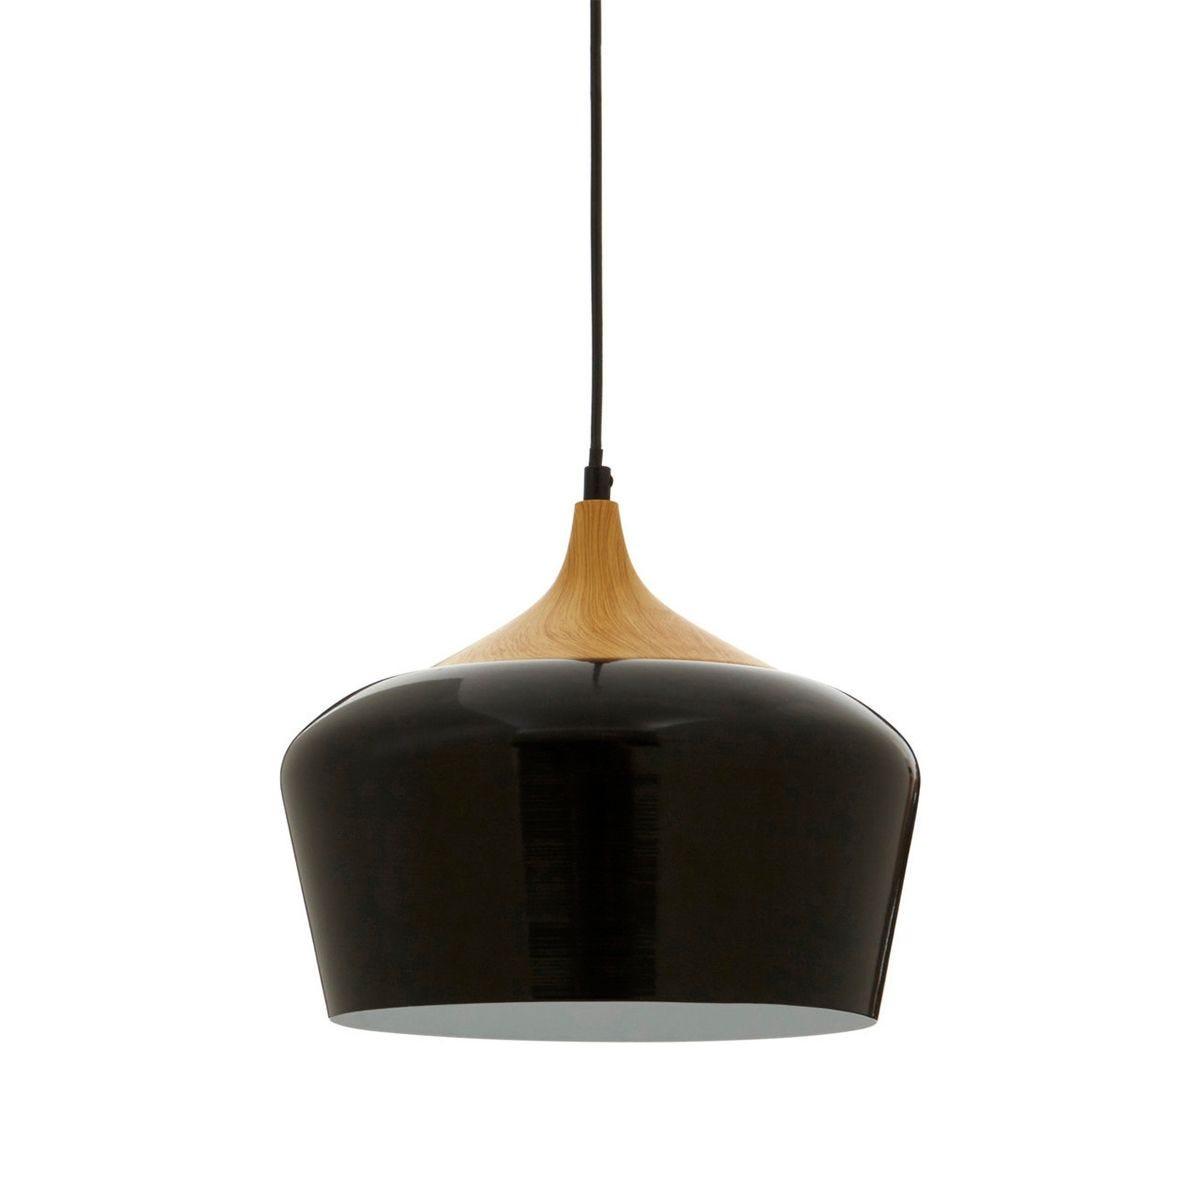 Pendant Light - Metal/Wood and Black